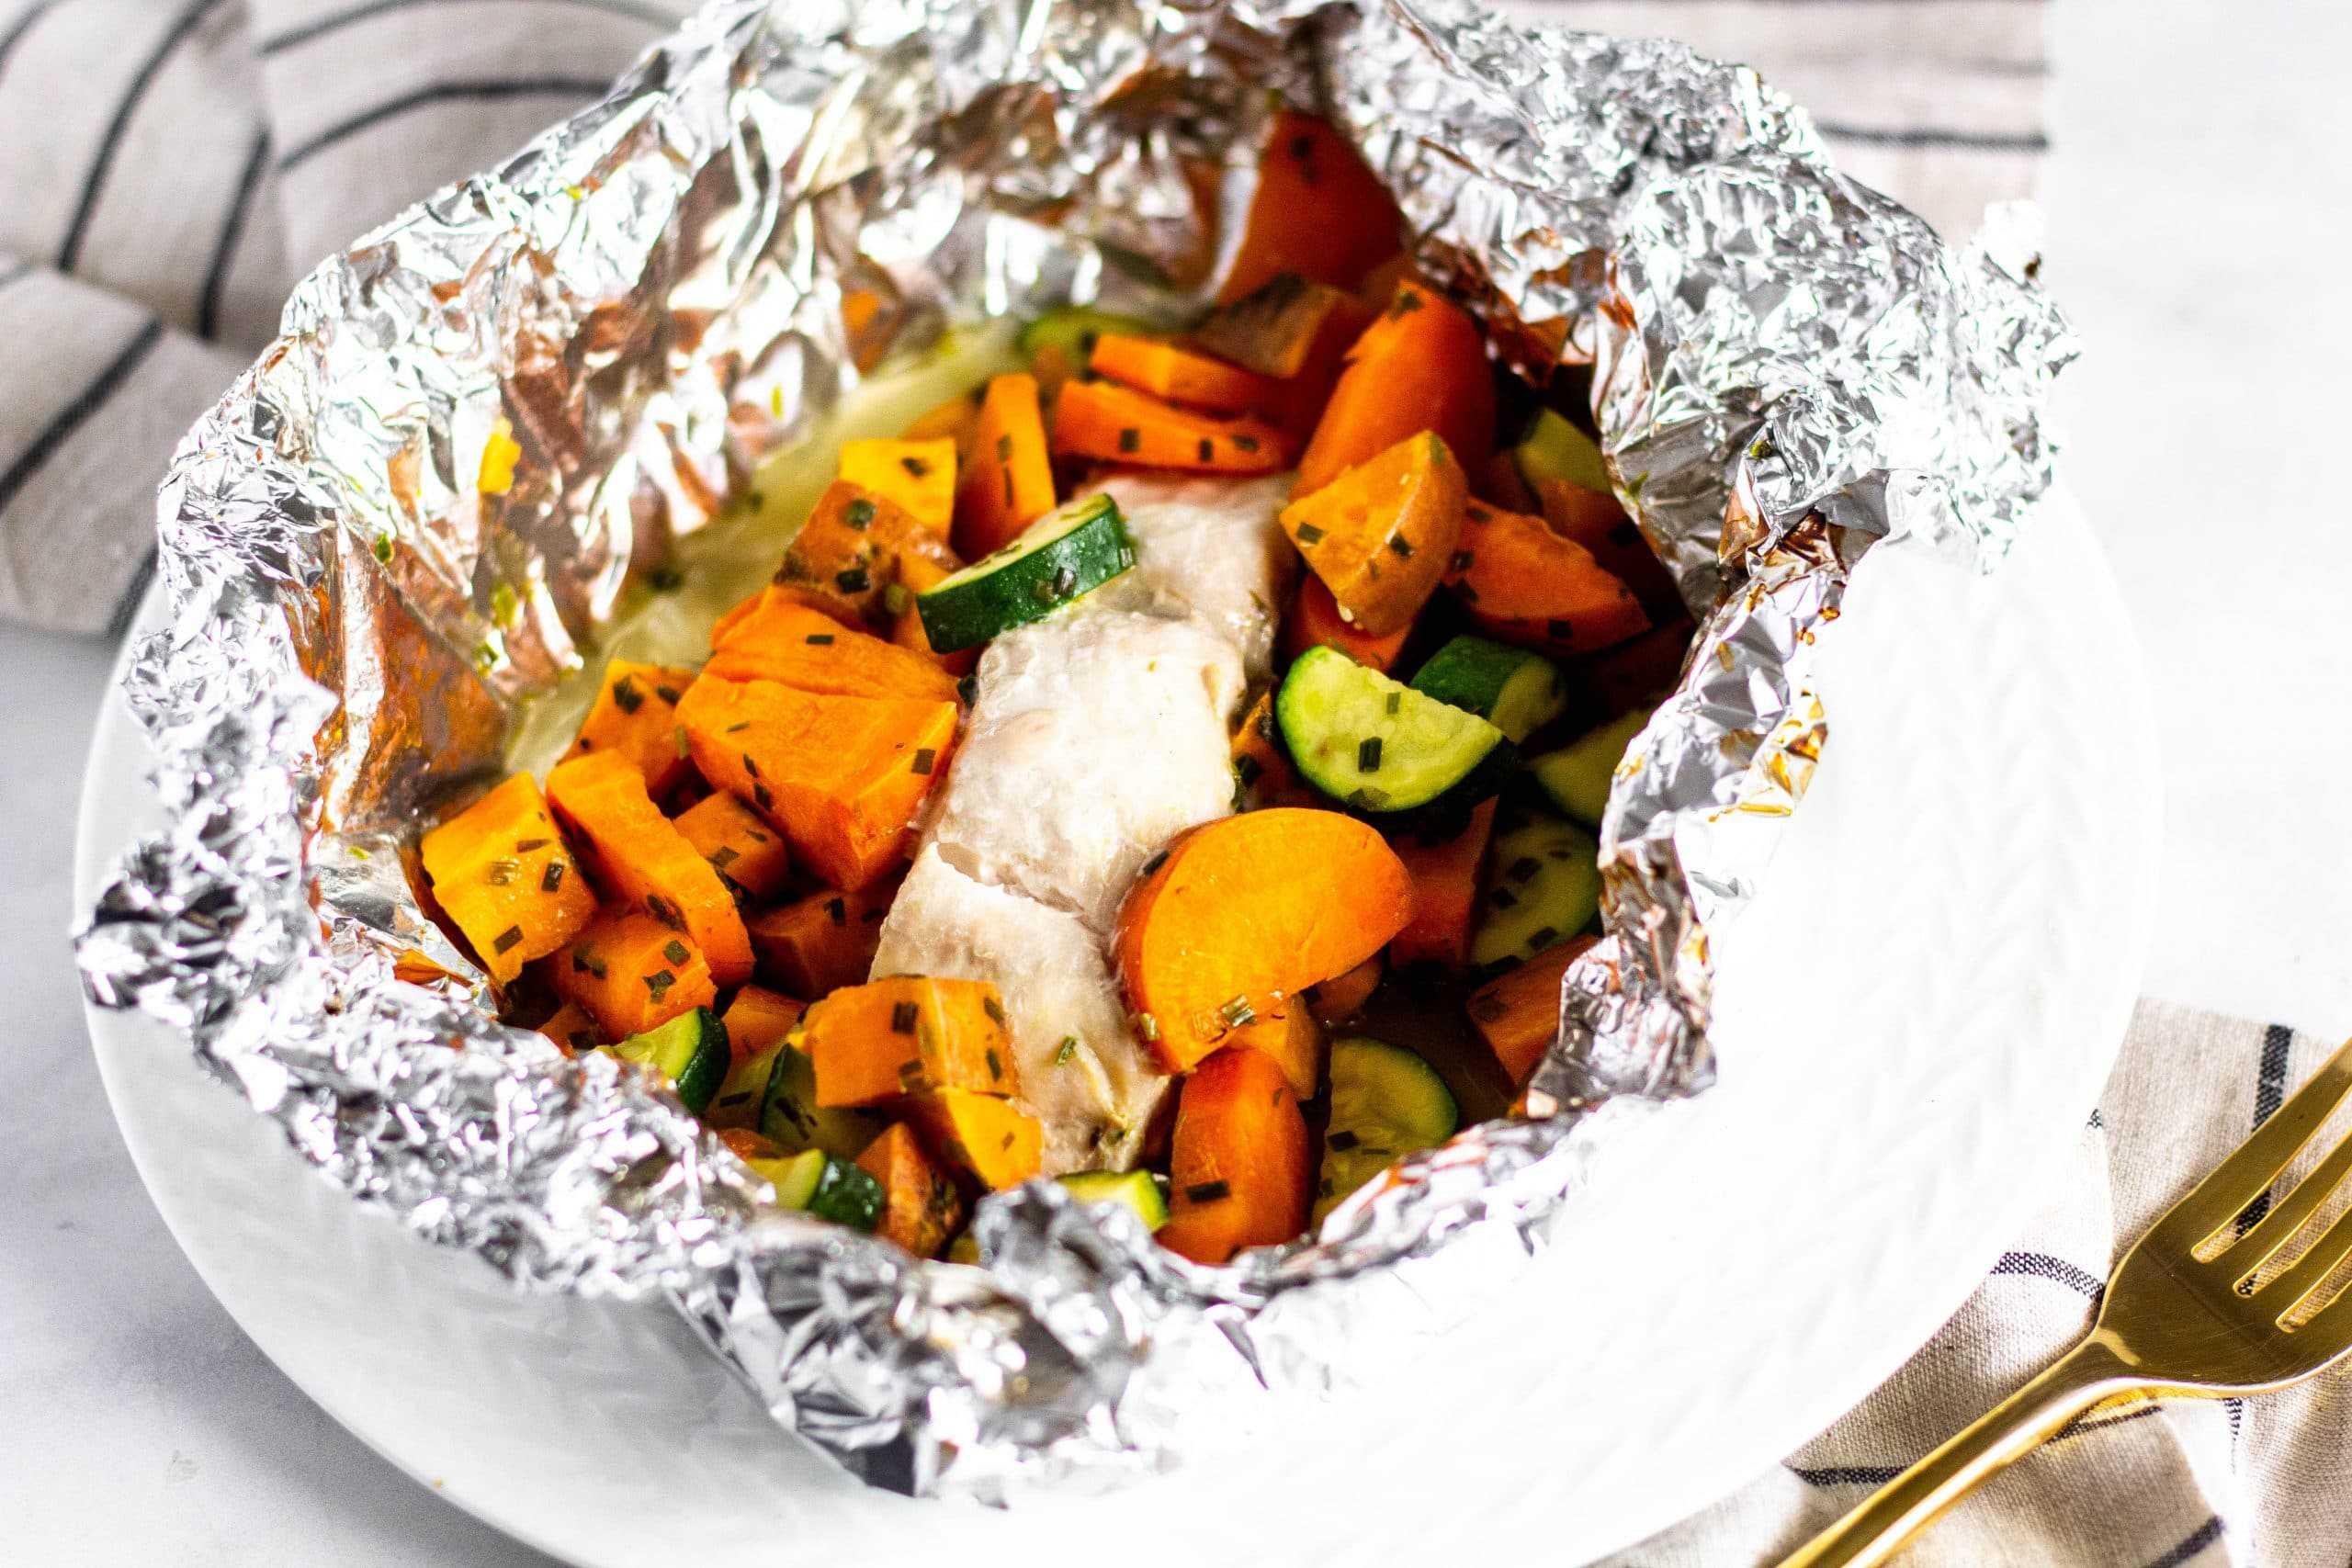 Easy Baked Fish in Foil Packets | Tara Rochford Nutrition #lowfodmap #foilpack #tararochfordnutrition